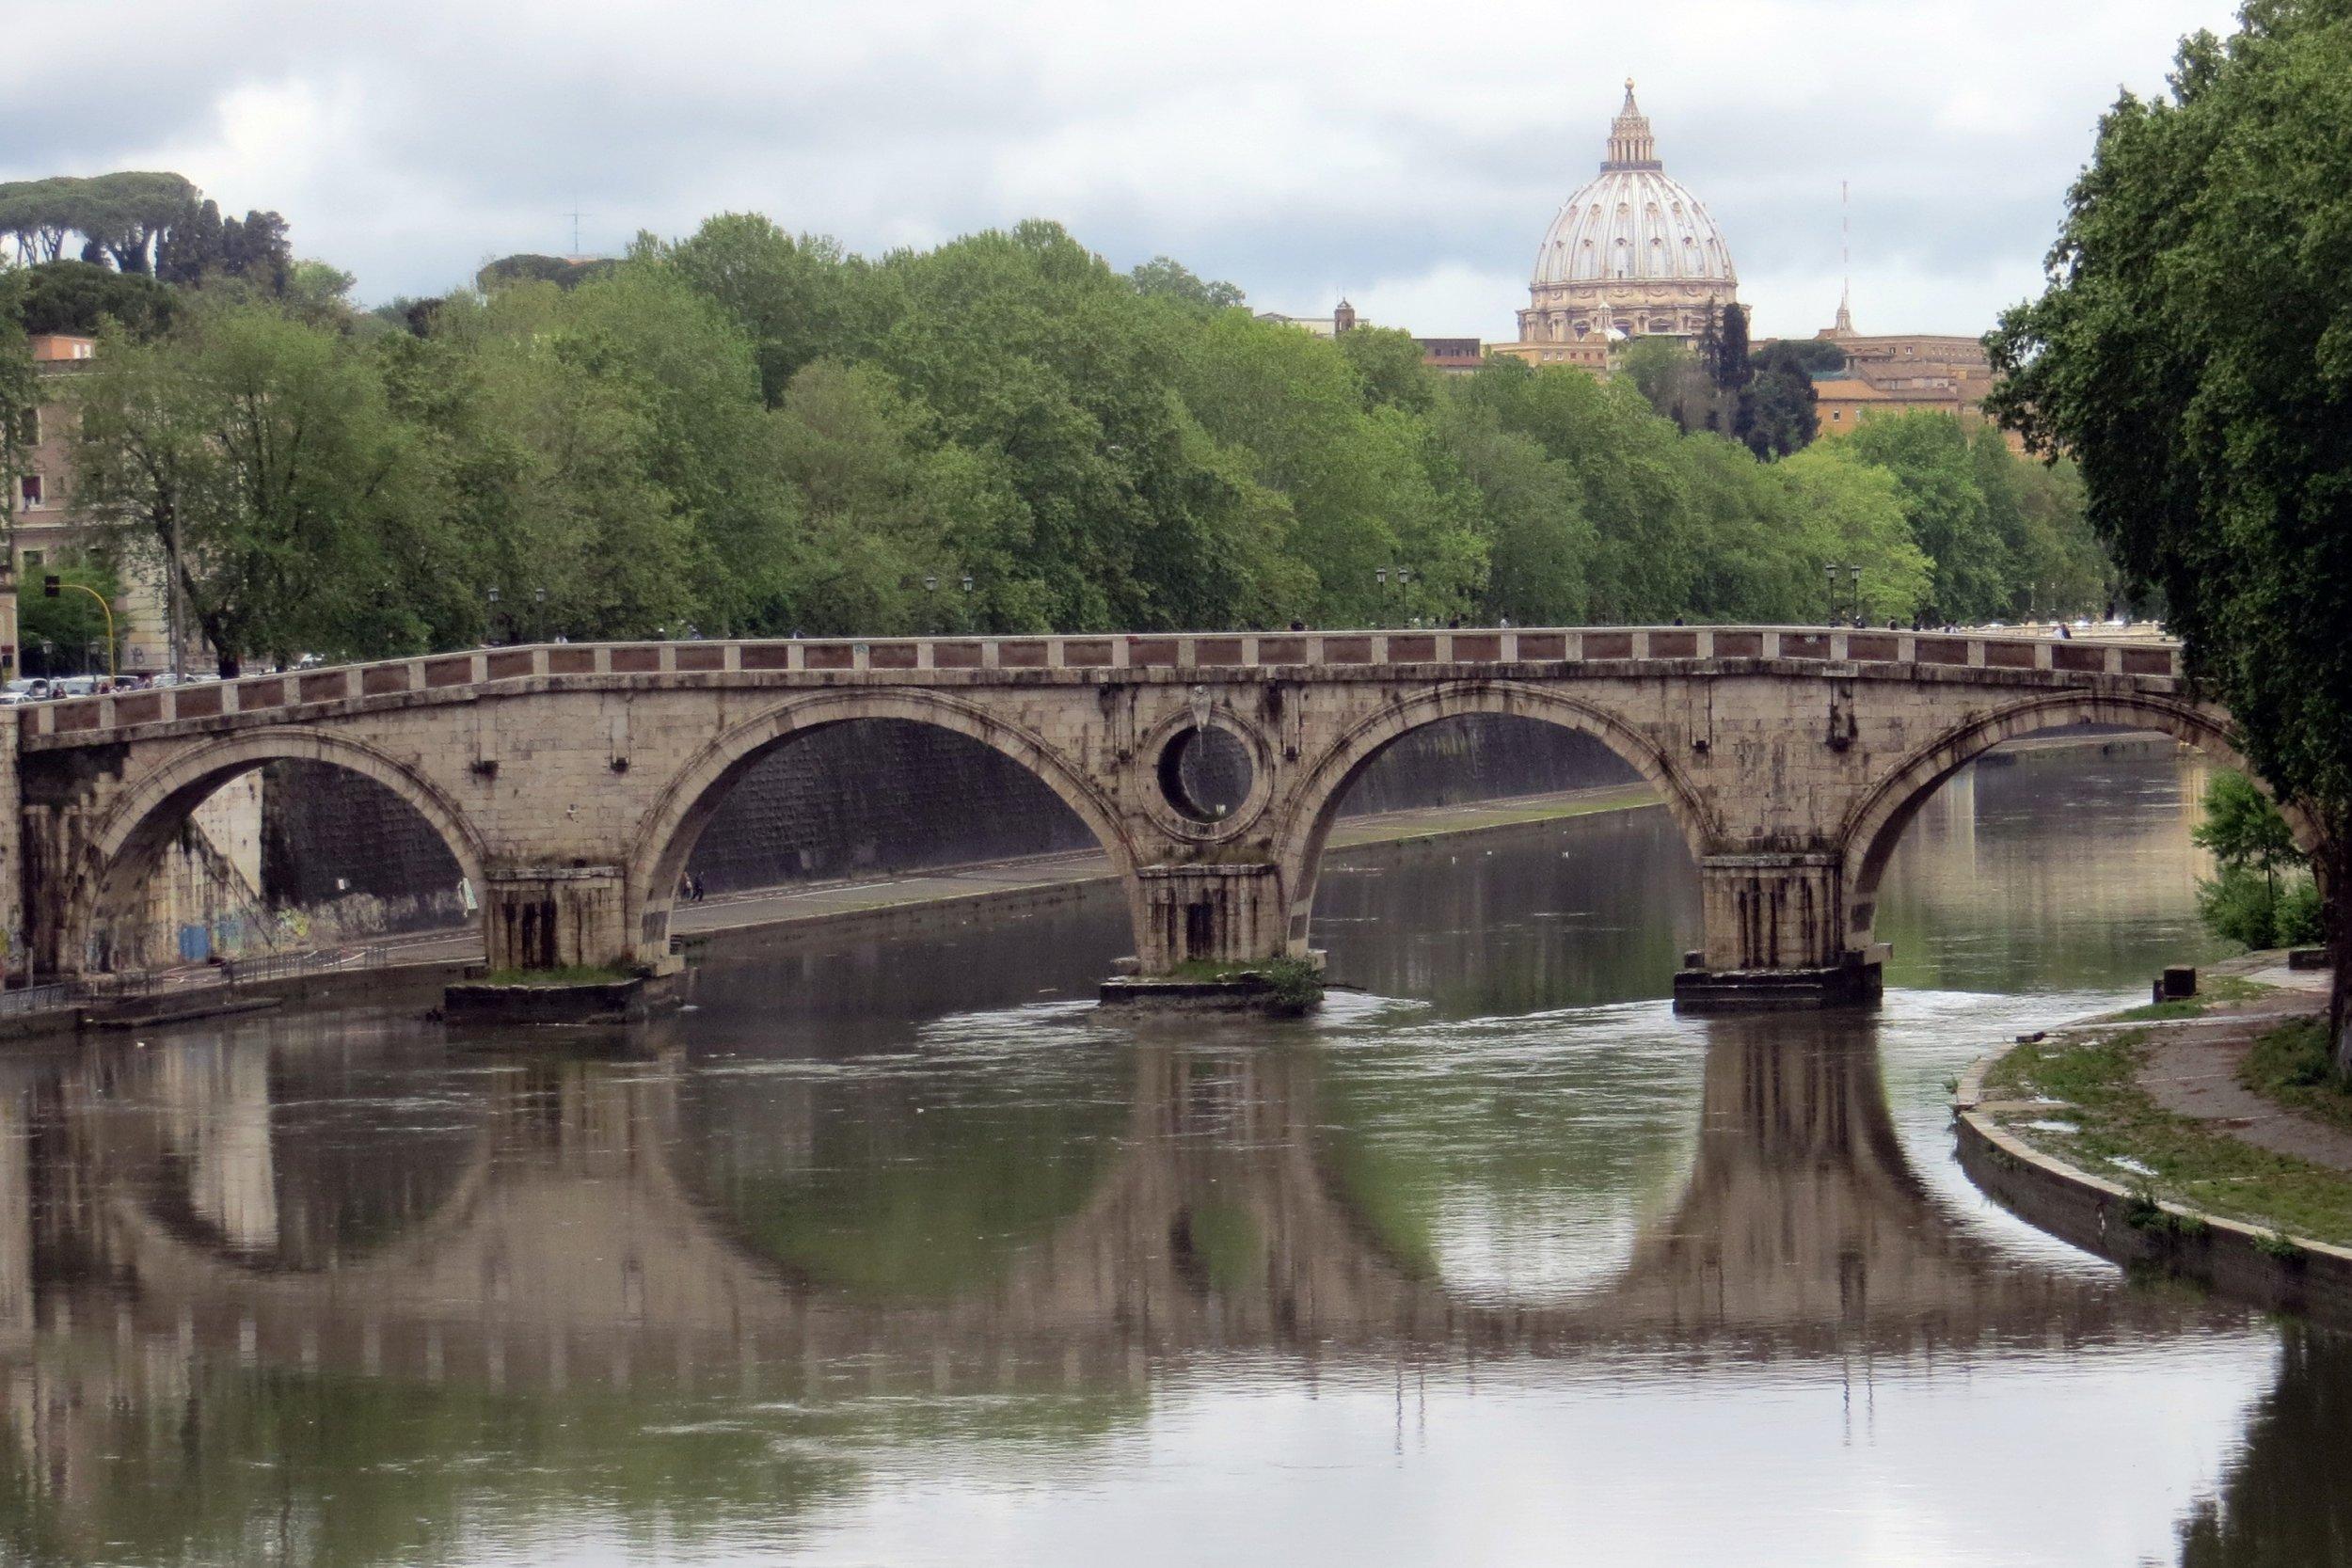 07_05_Beau_Solomon_Rome